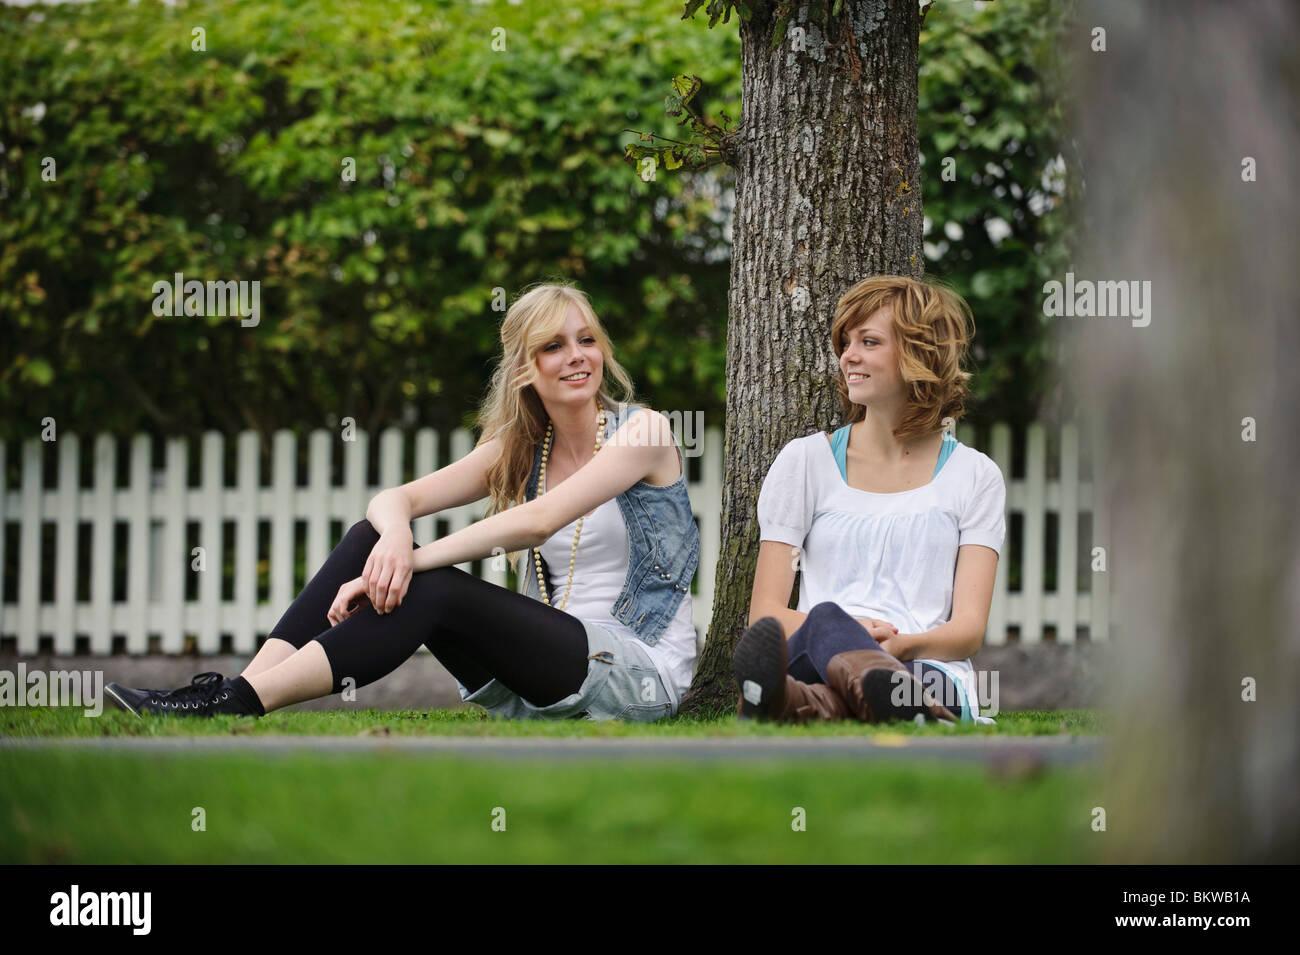 Two girls sitting under tree - Stock Image